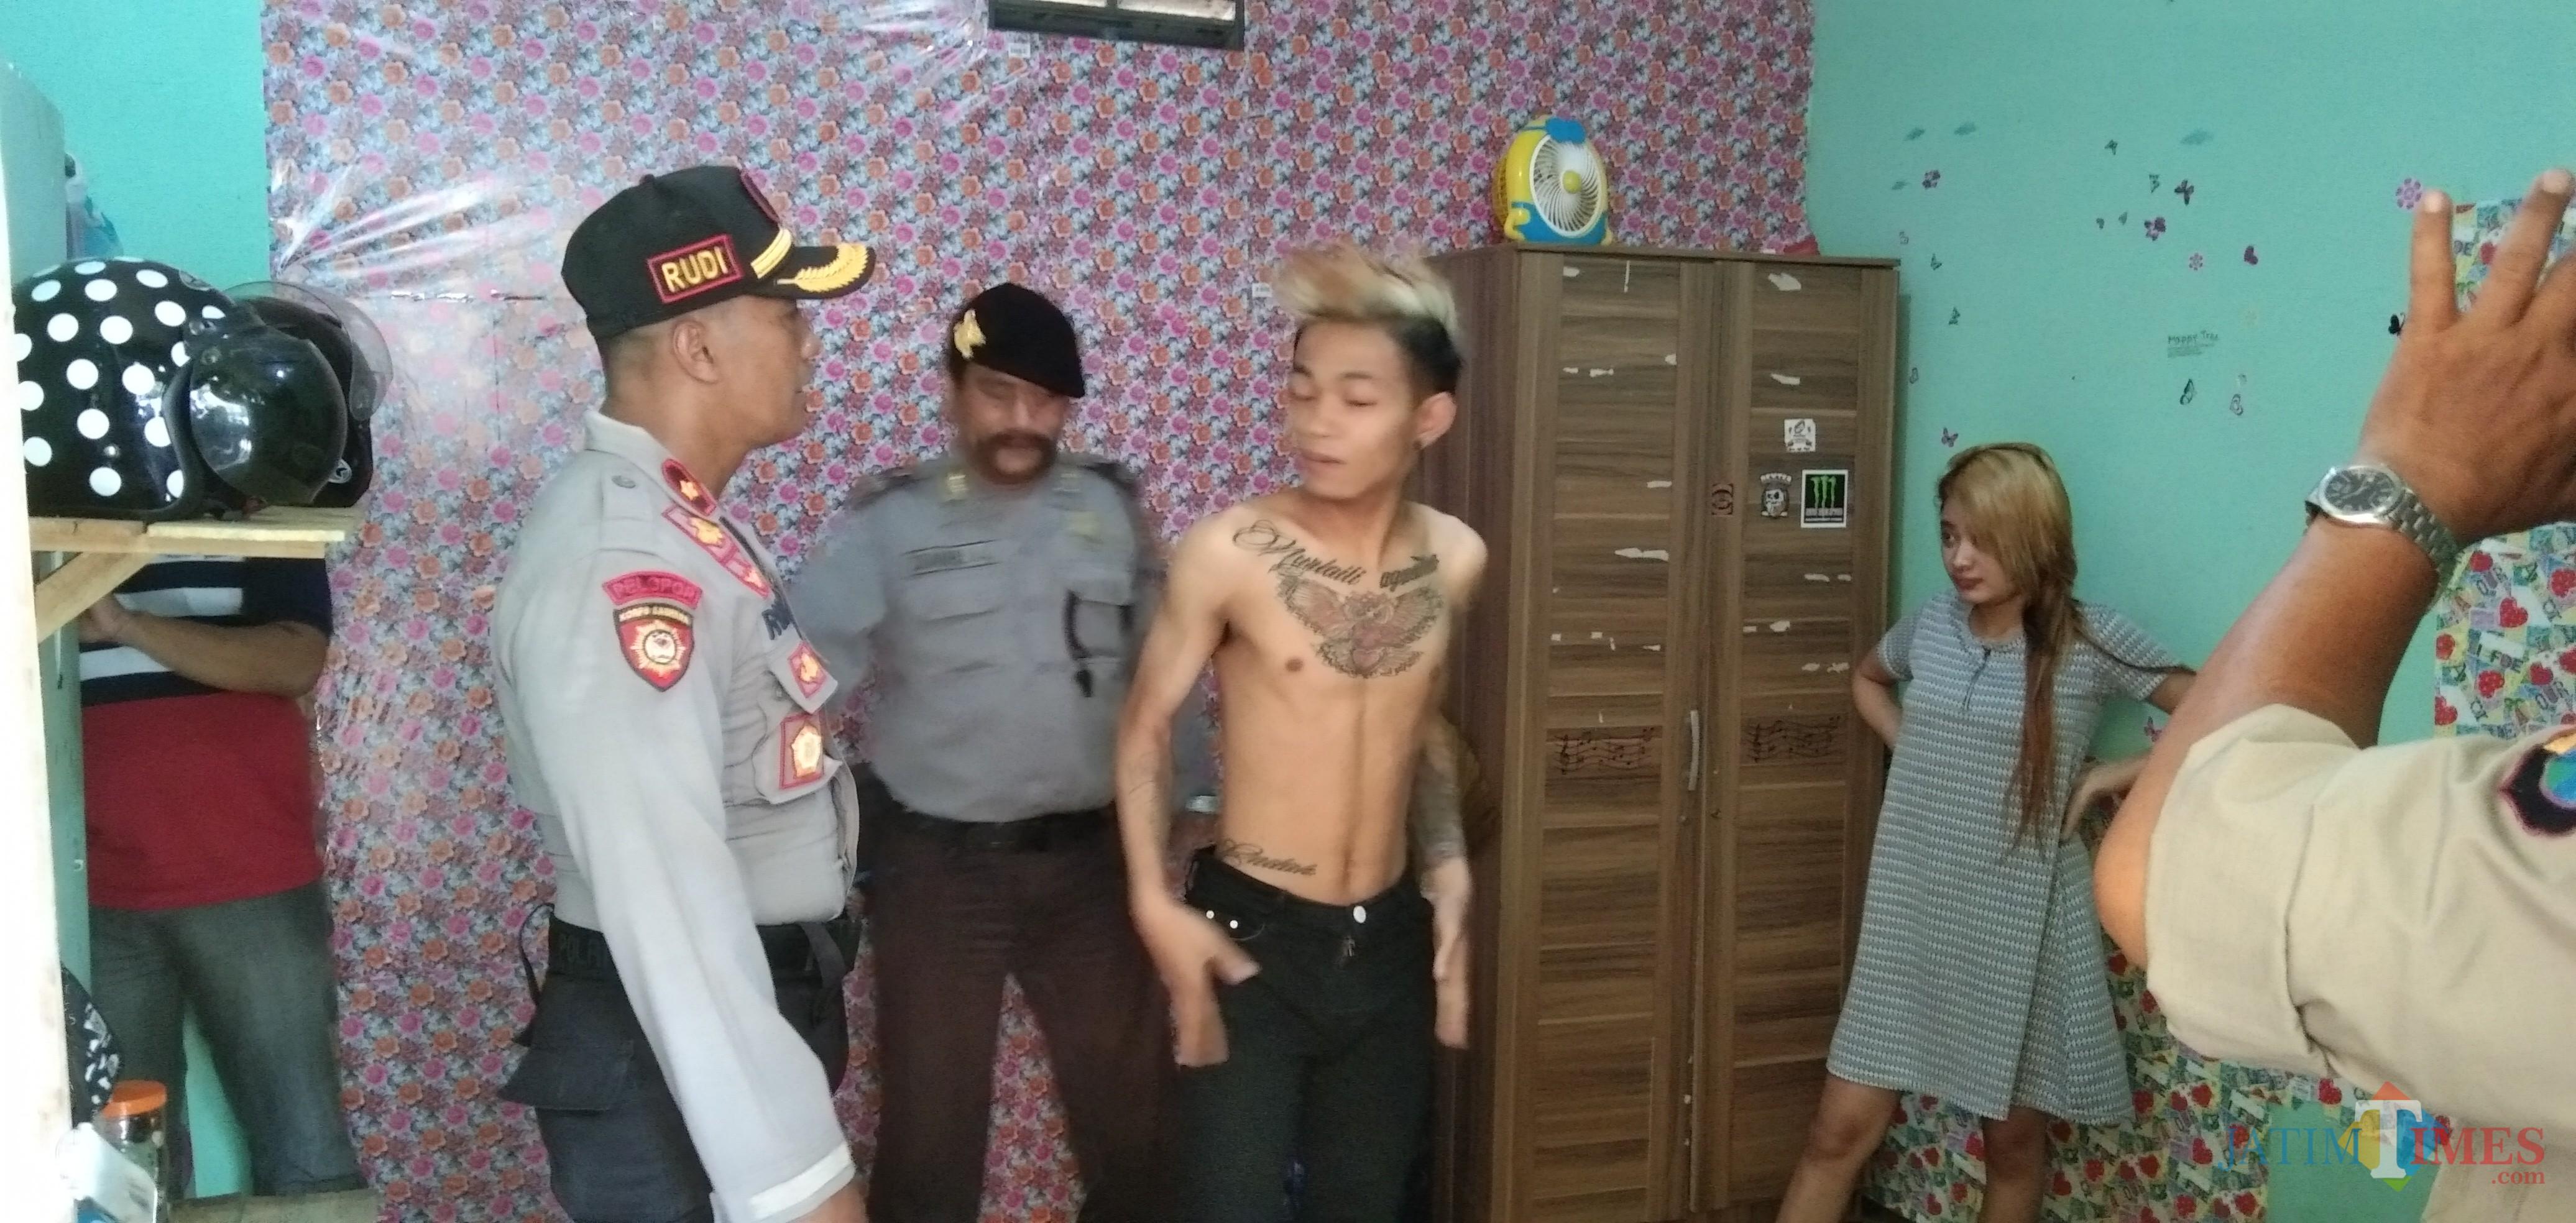 Kapolsek Tulungagung Kota, Kompol Rudi Purwanto saat memeriksa tempat kost (foto: Joko Pramono/ JatimTIMES)